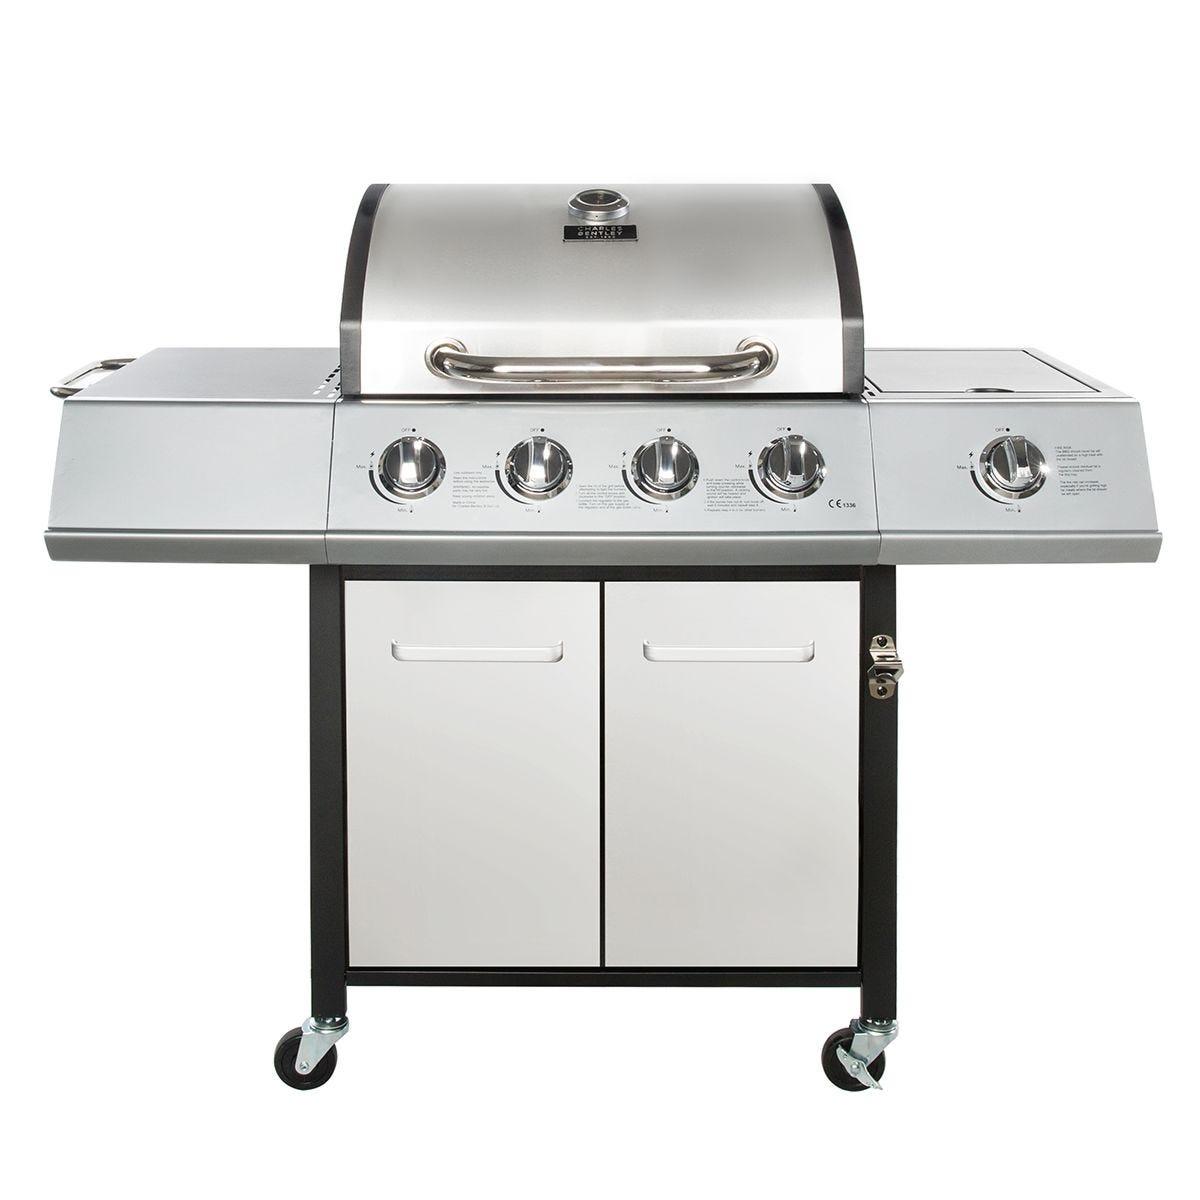 Charles Bentley 5 Burner (4 + side) Premium Gas BBQ - Silver